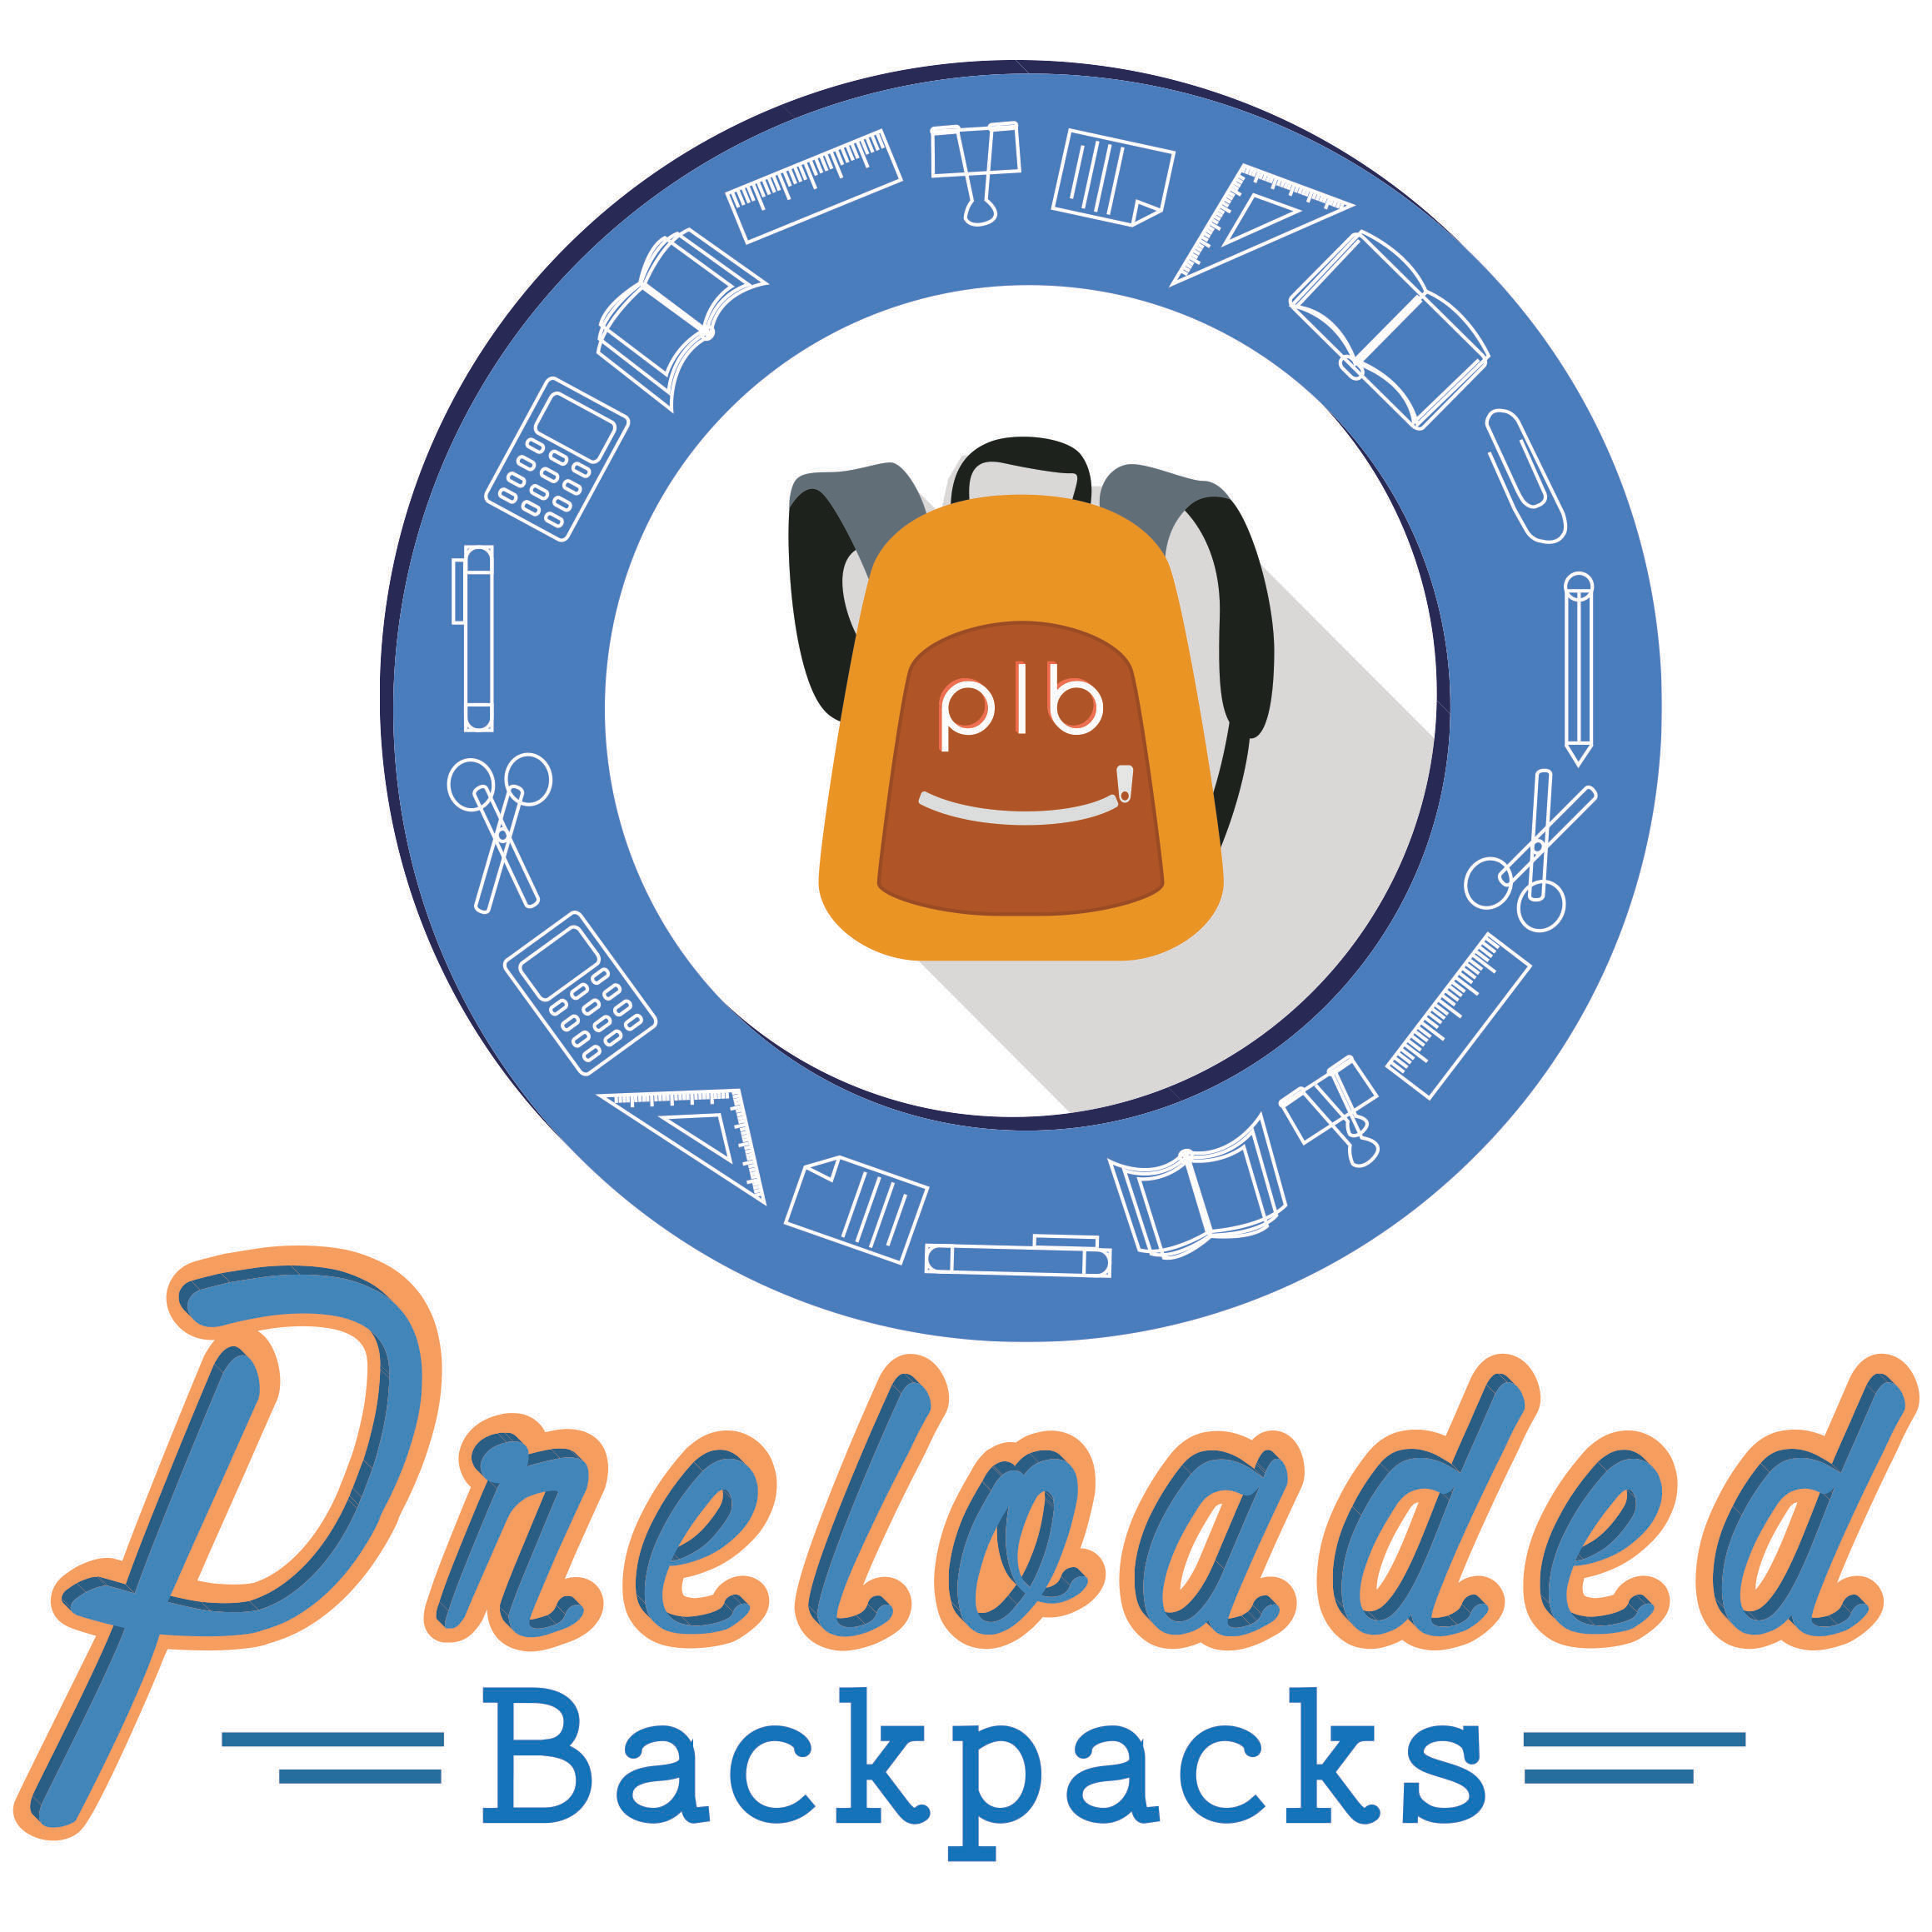 Preloaded Backpacks